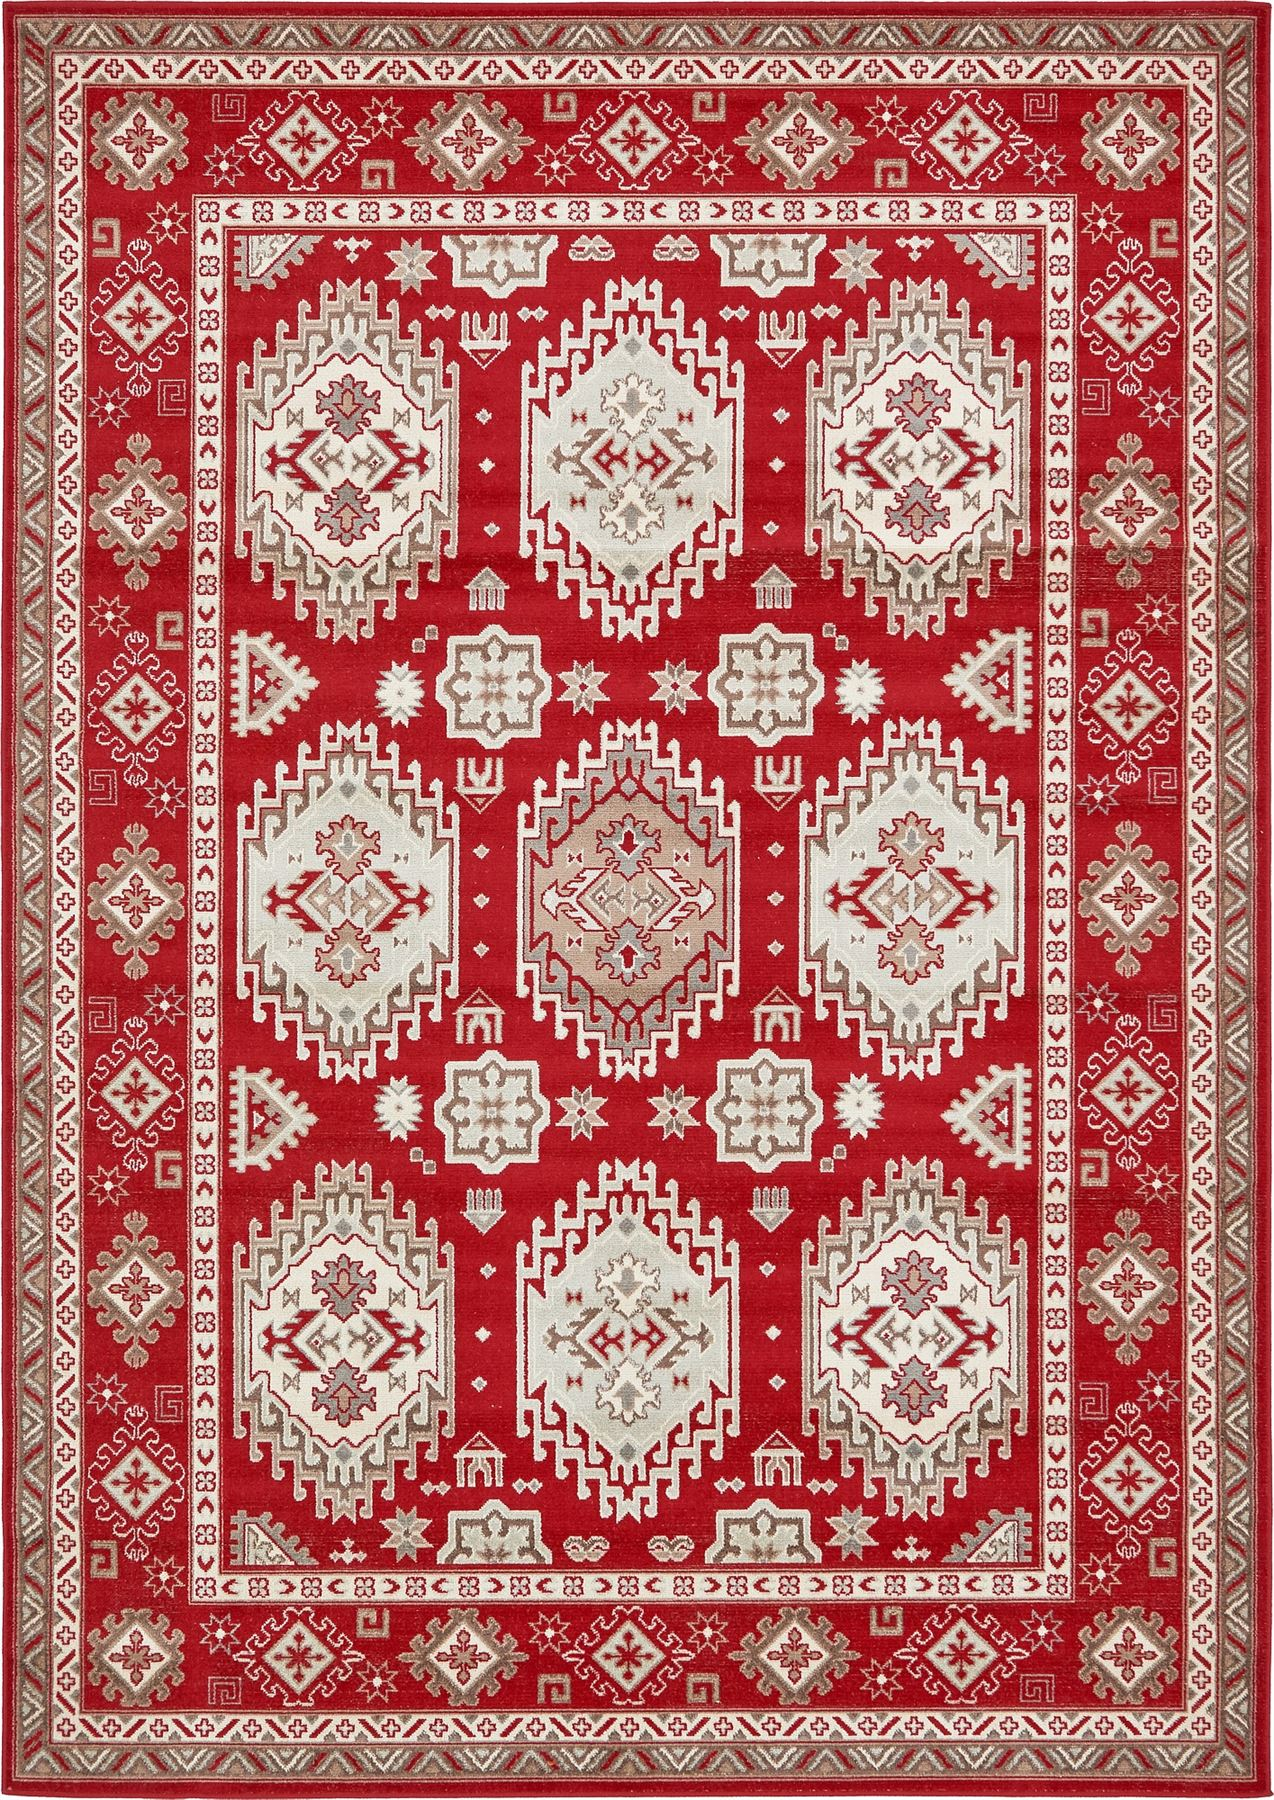 Oriental Rugs New Modern Carpets Area Rug Tribal Floor